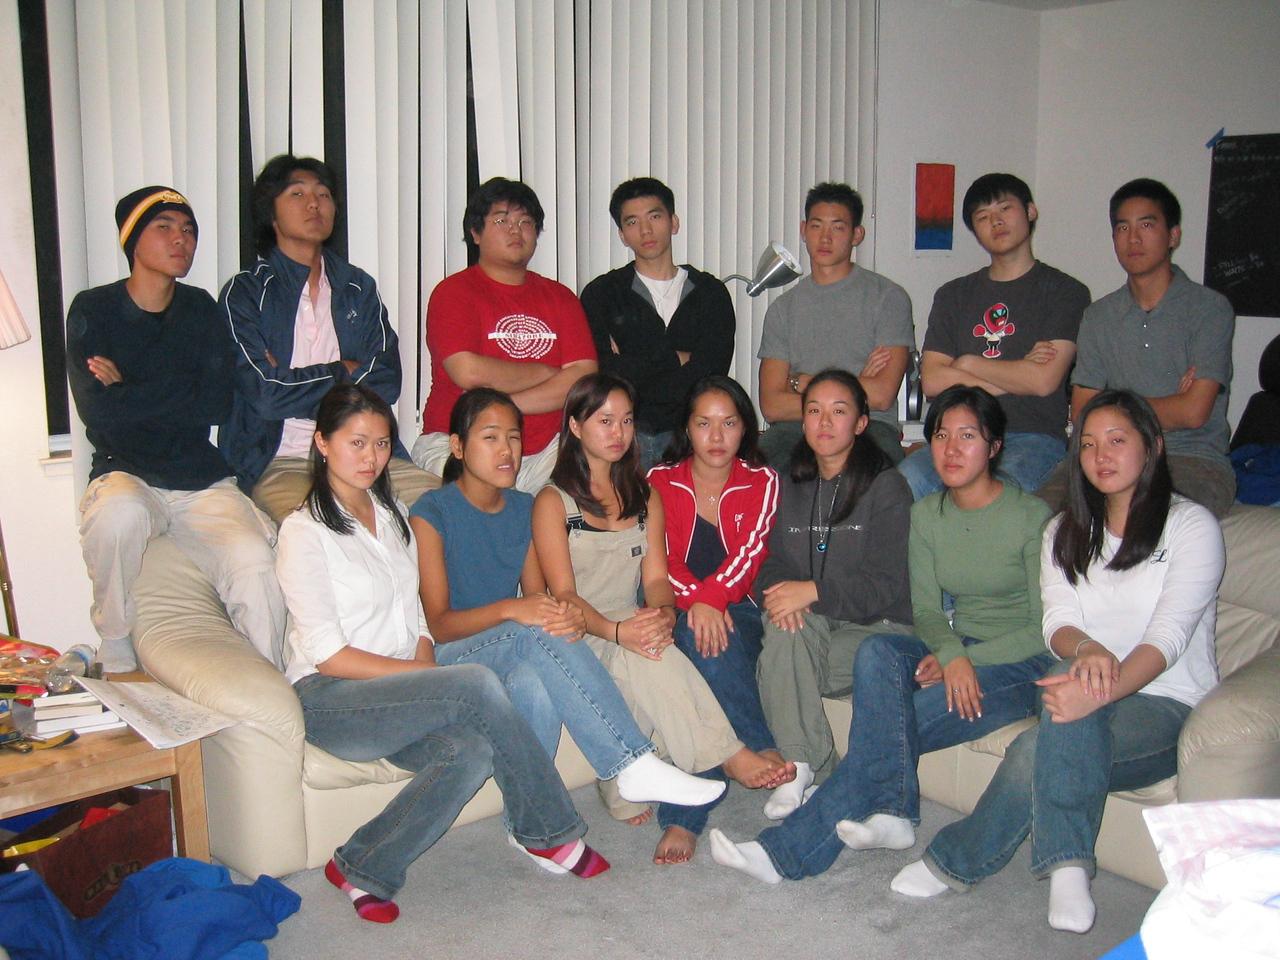 2004 10 17 Sunday - FCS Fall 2004 mug group pic